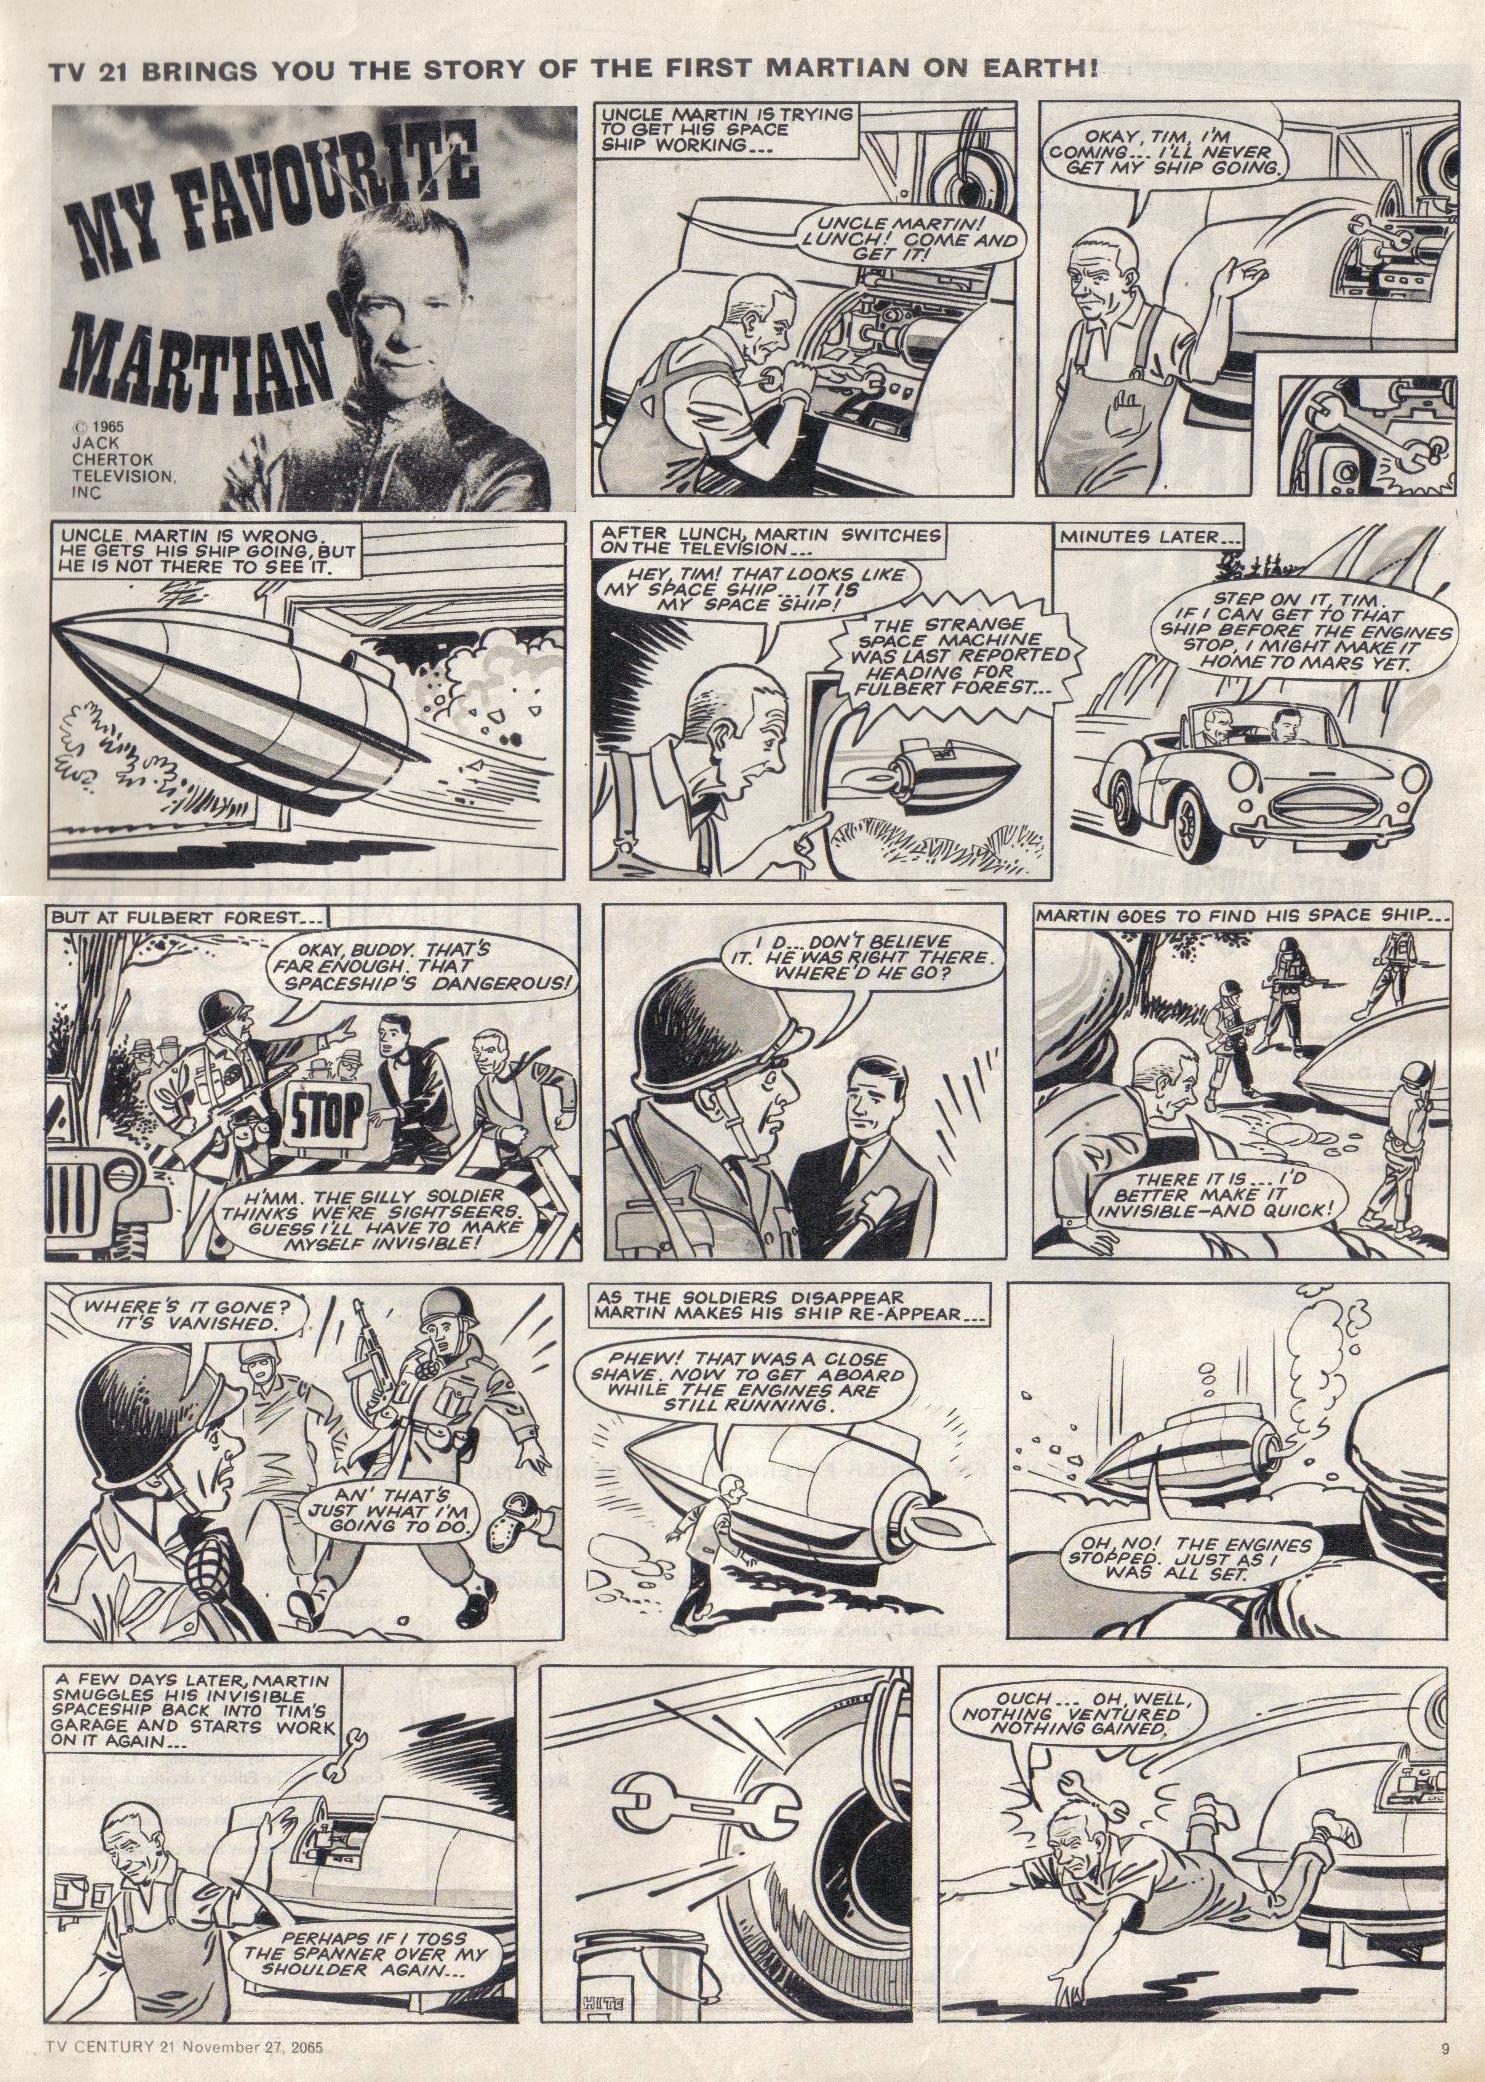 Read online TV Century 21 (TV 21) comic -  Issue #45 - 9